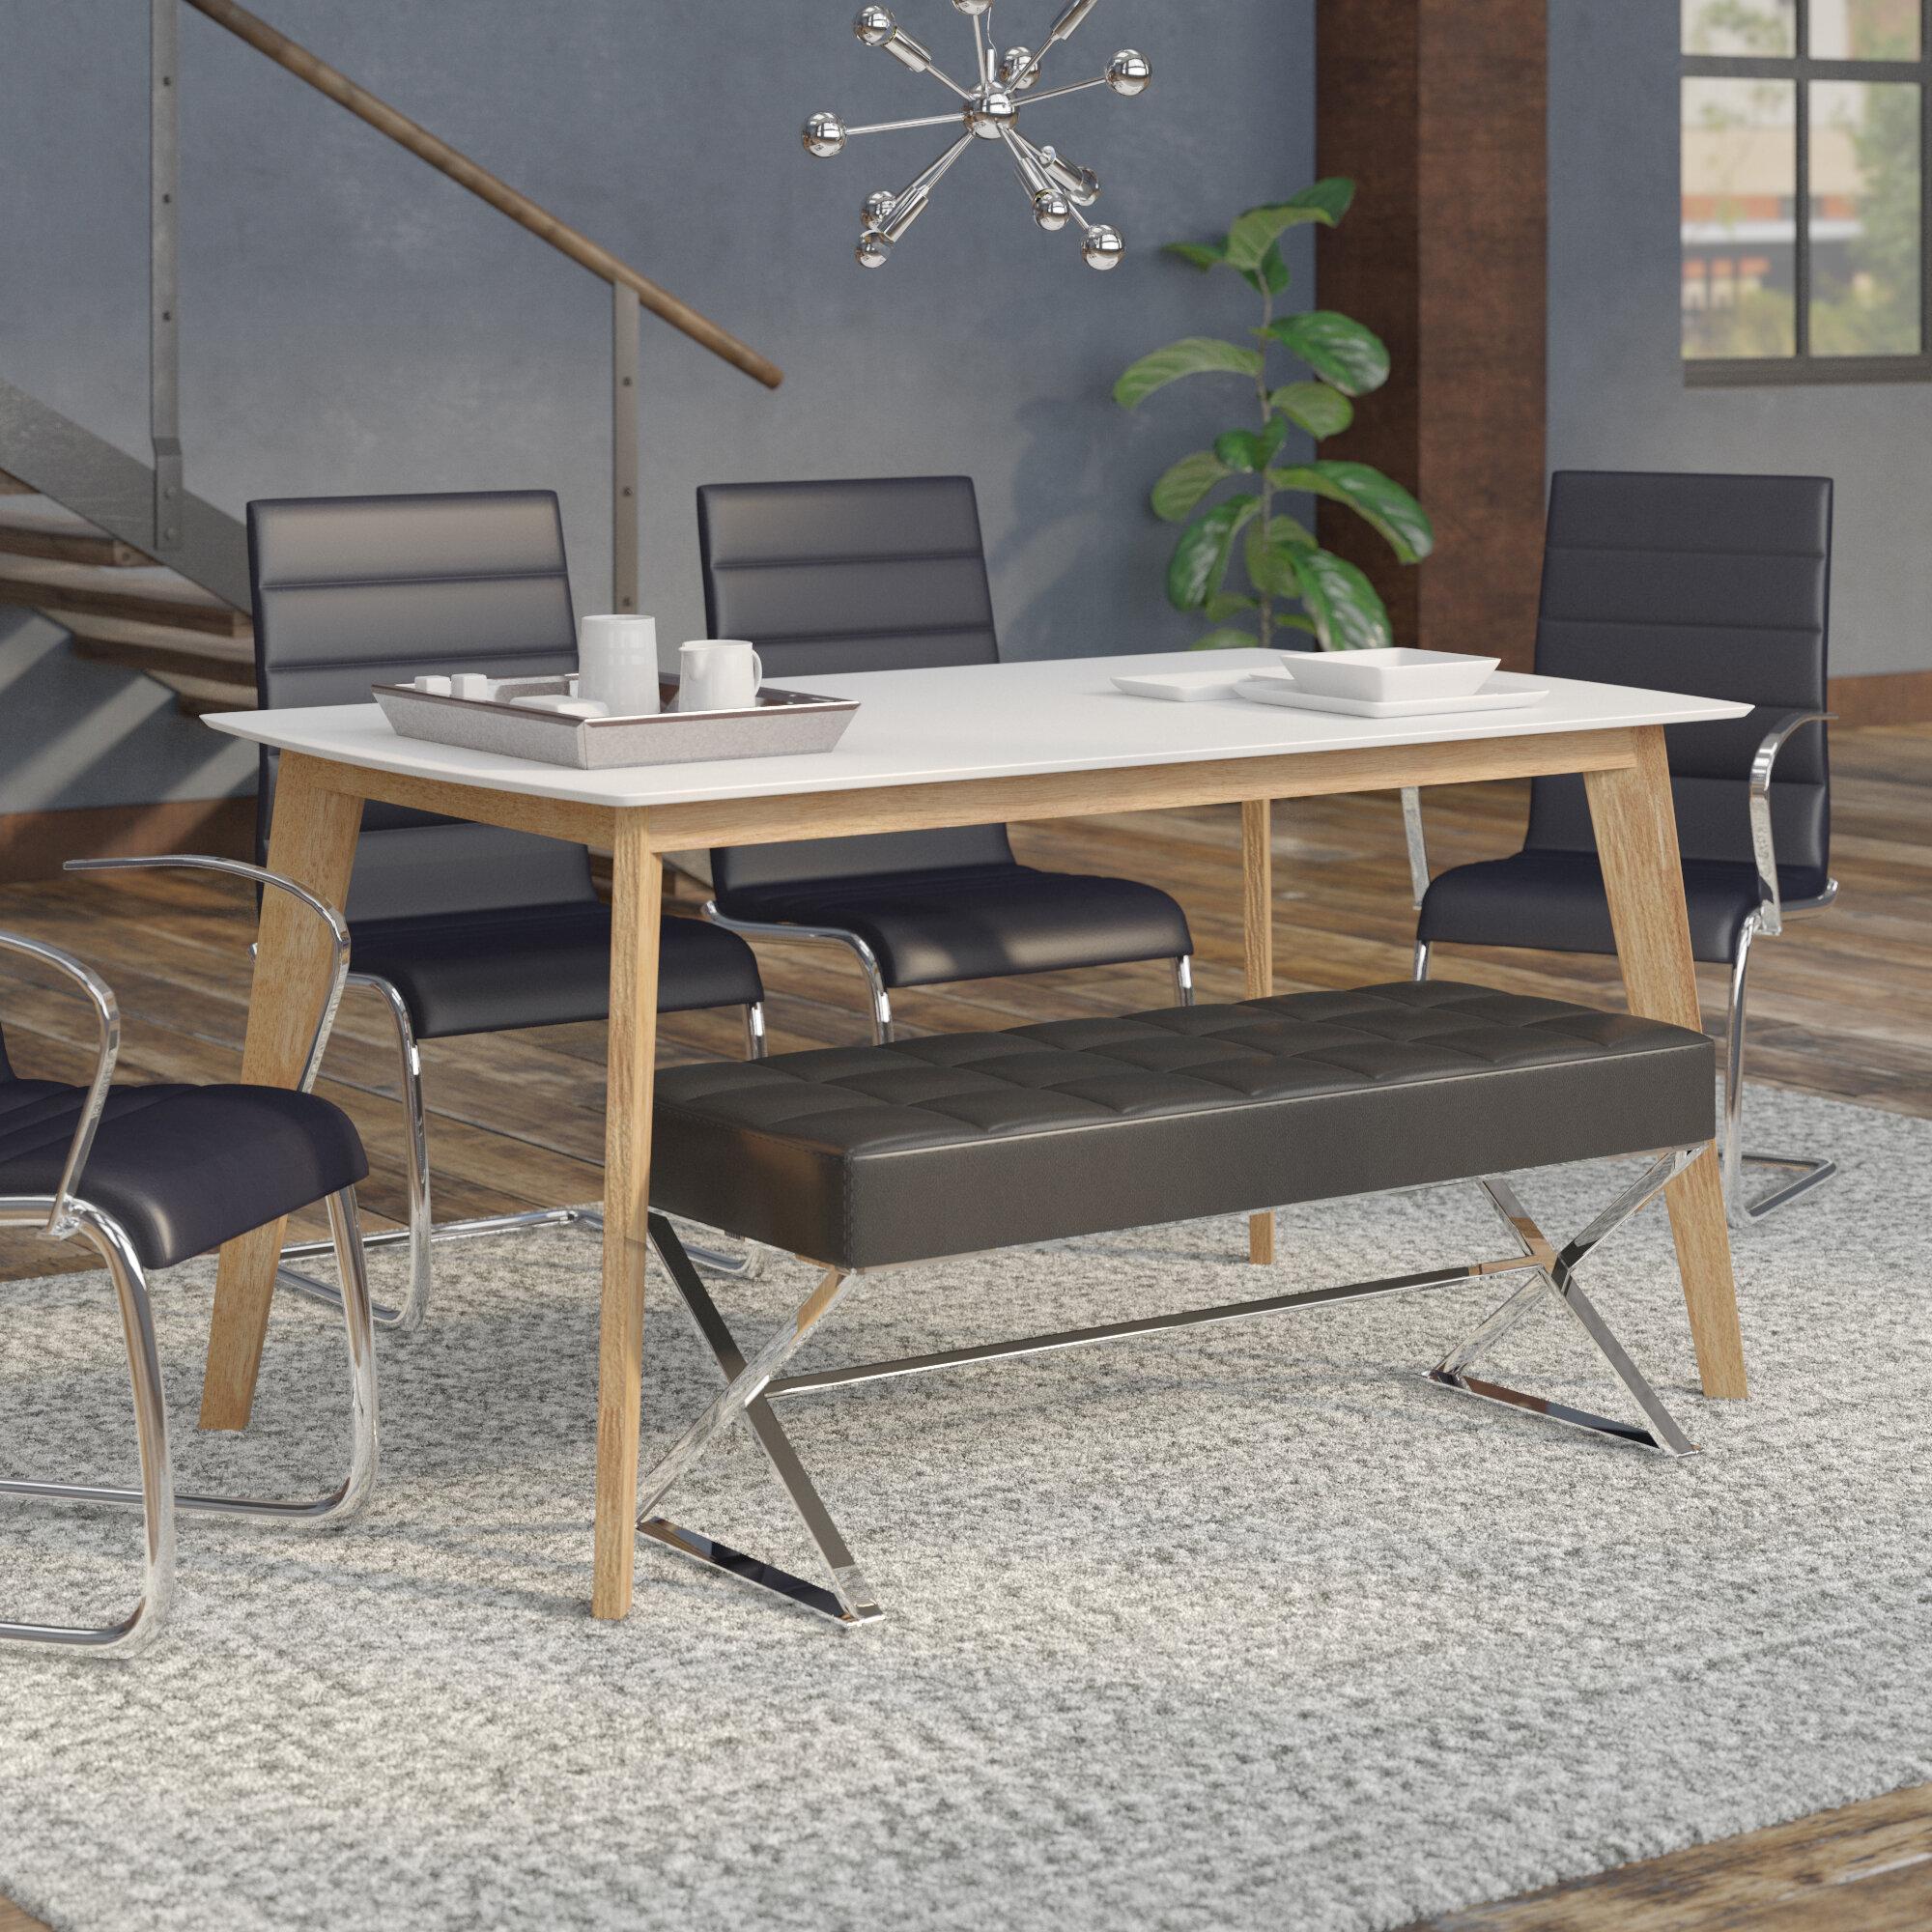 Hummer retro modern dining table